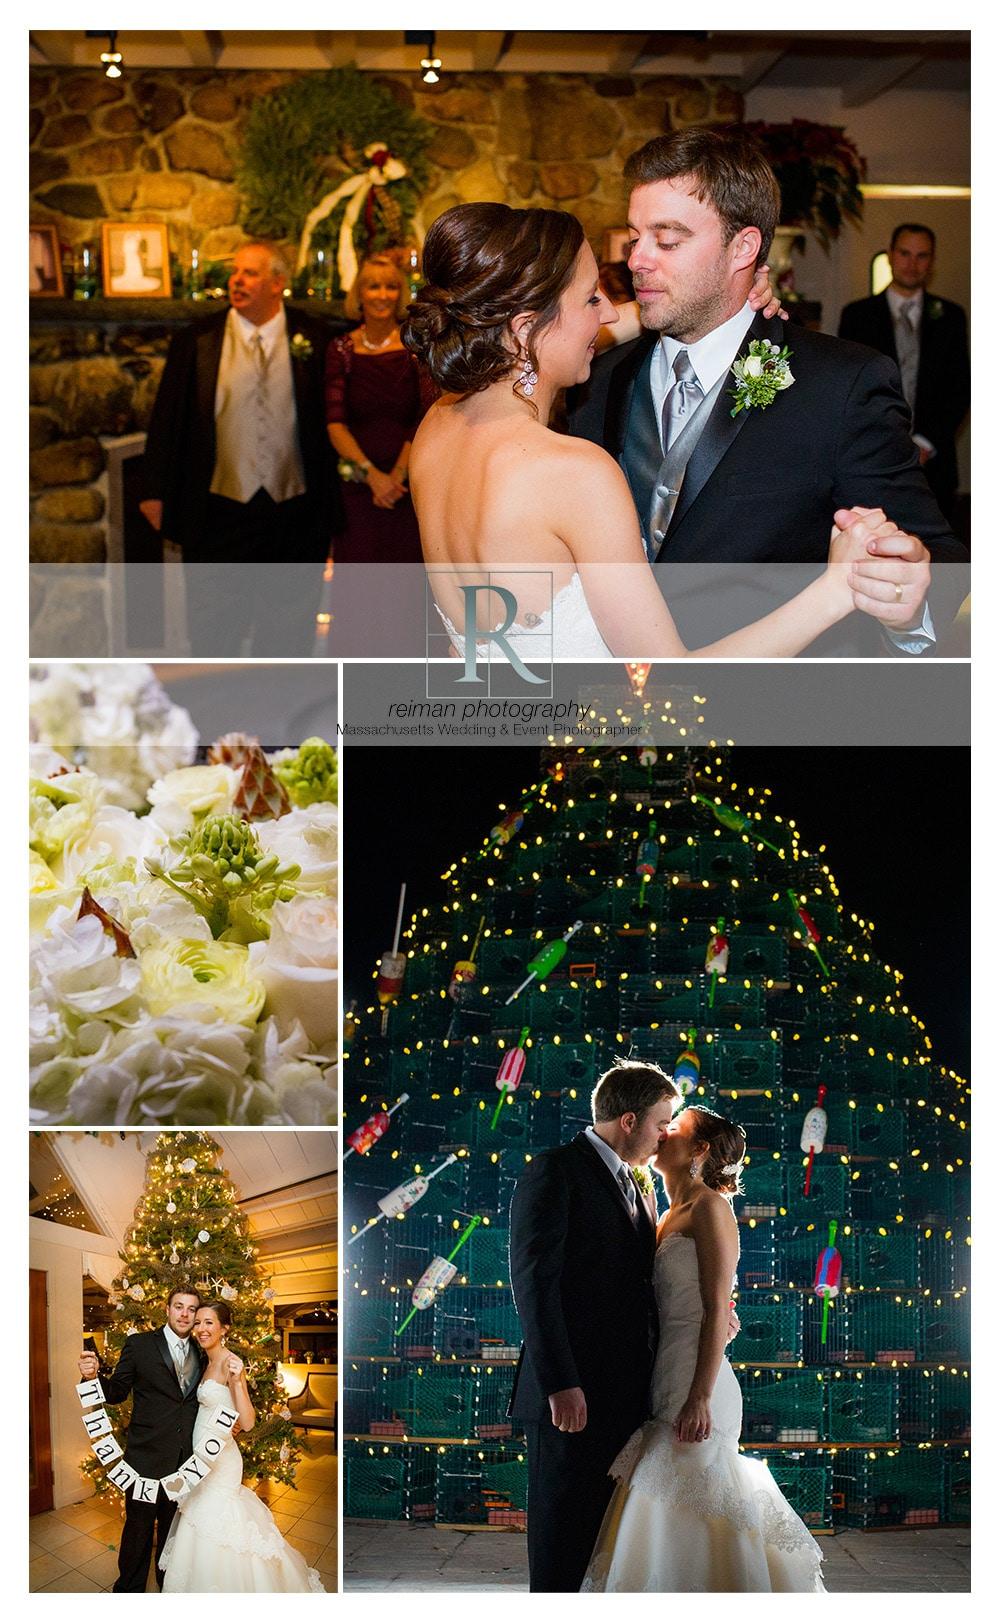 Cohasset Wedding, Reiman Photography, Atlantica, 12.13.14